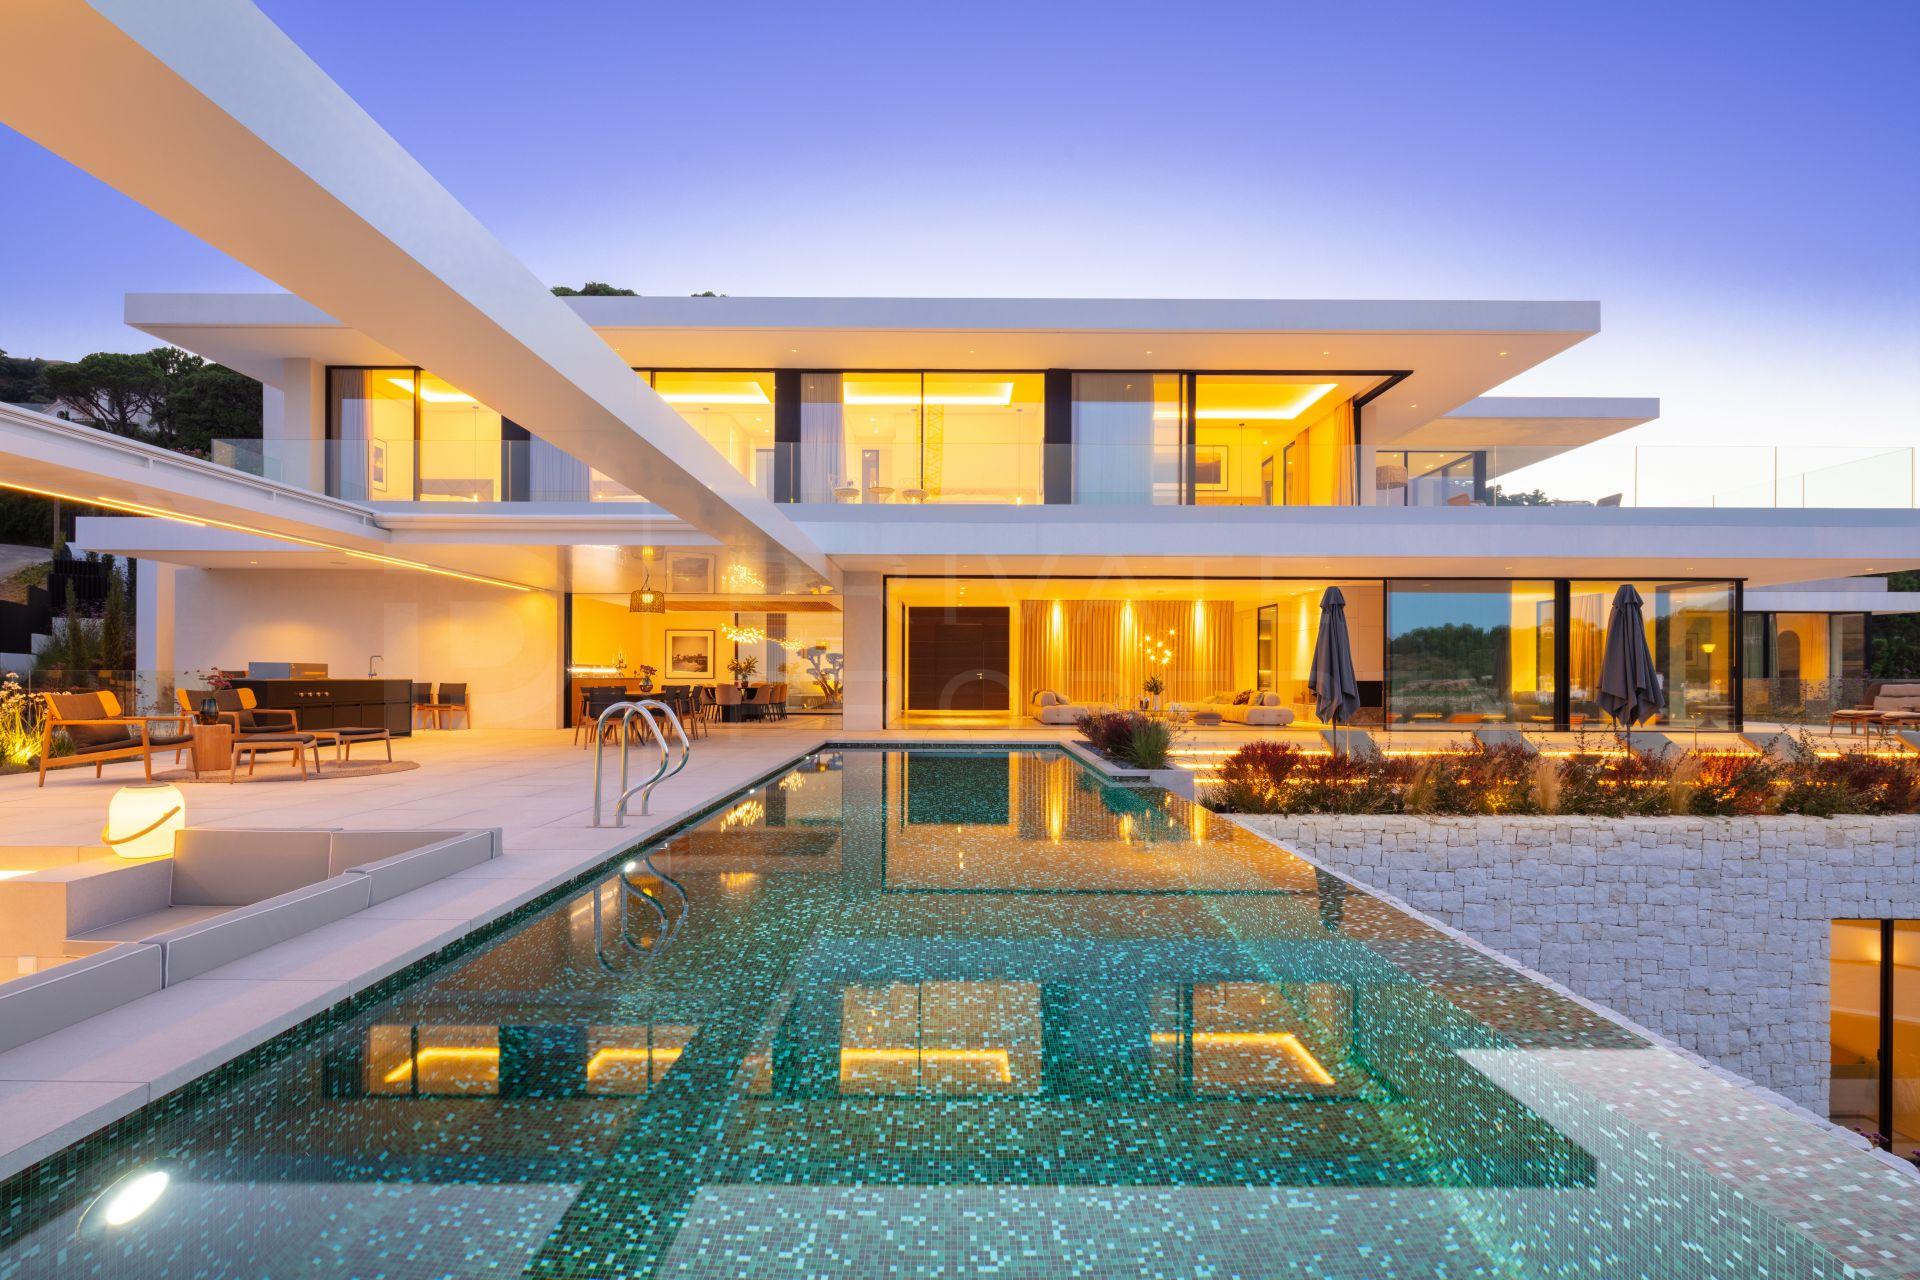 Striking brand new villa in El Madronal